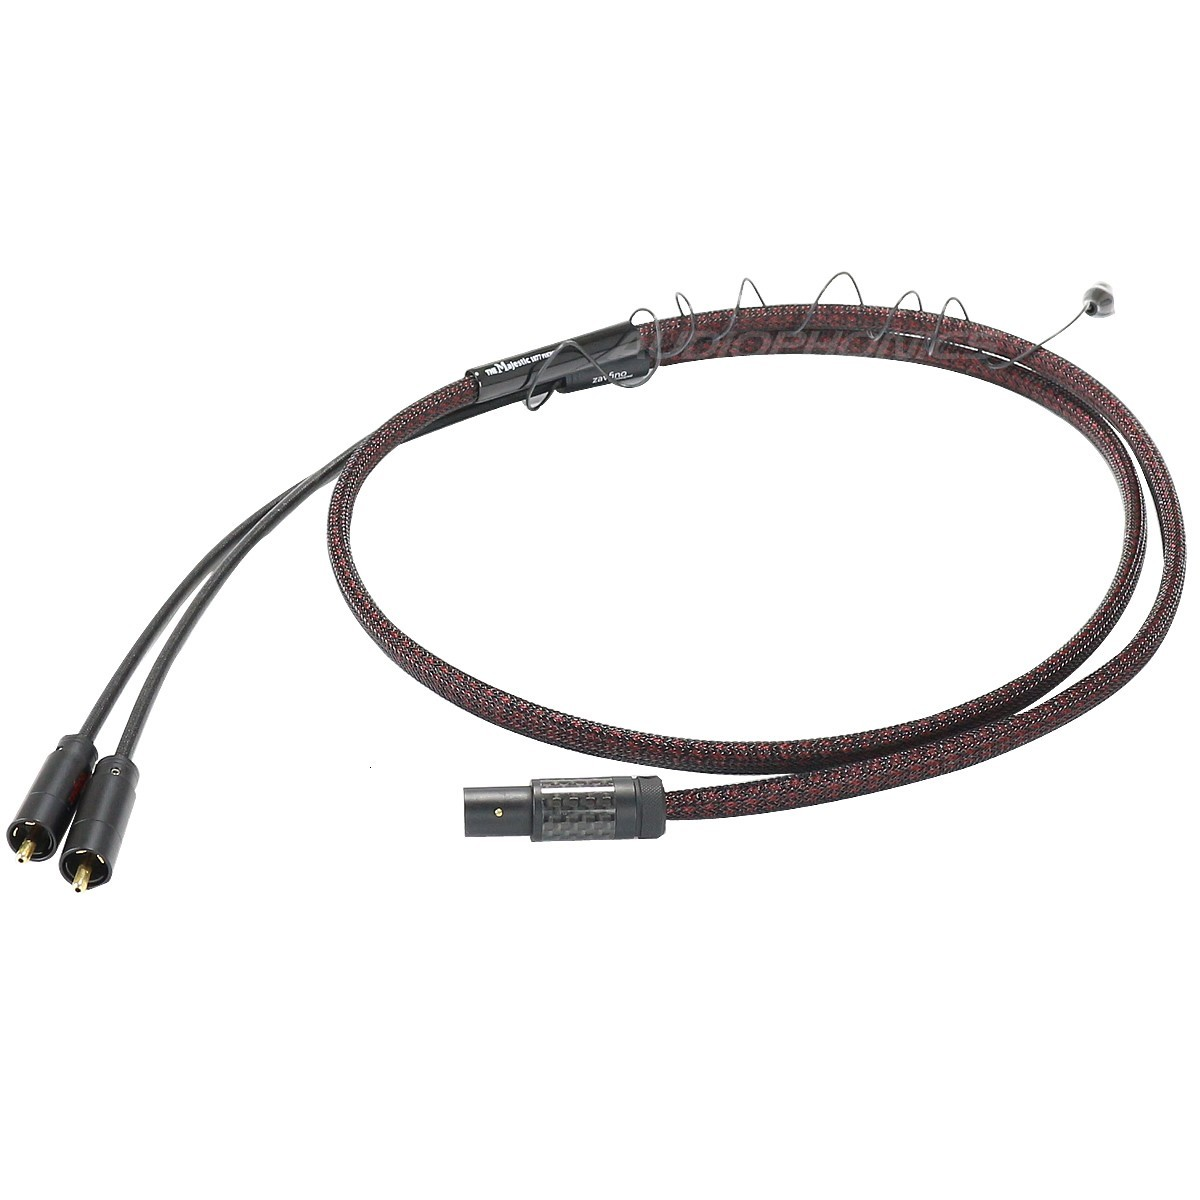 1877PHONO THE MAJESTIC MKII ST Câble Phono DIN 5 Broches - 2 RCA 1.5m